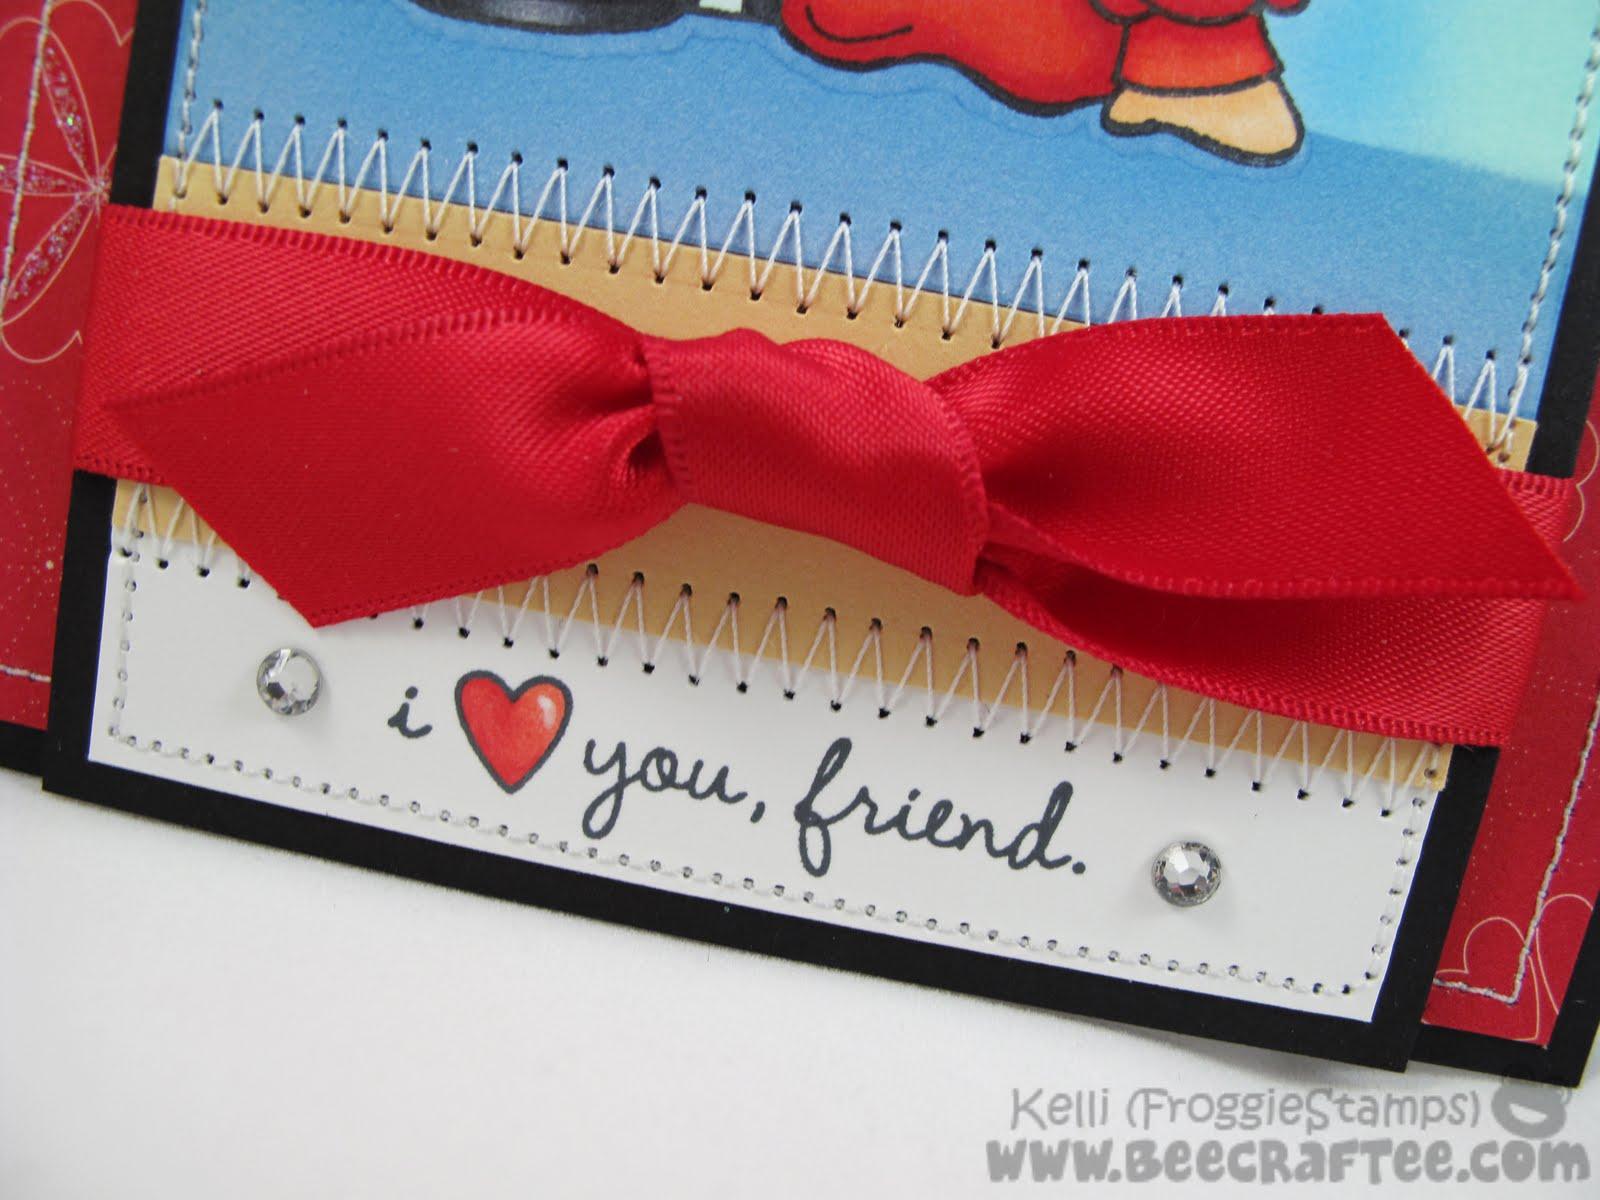 Attractive Copic Blonde Hair I Love You Friend 4 Love You Friendship Love You Friend Clipart inspiration Love You Friend